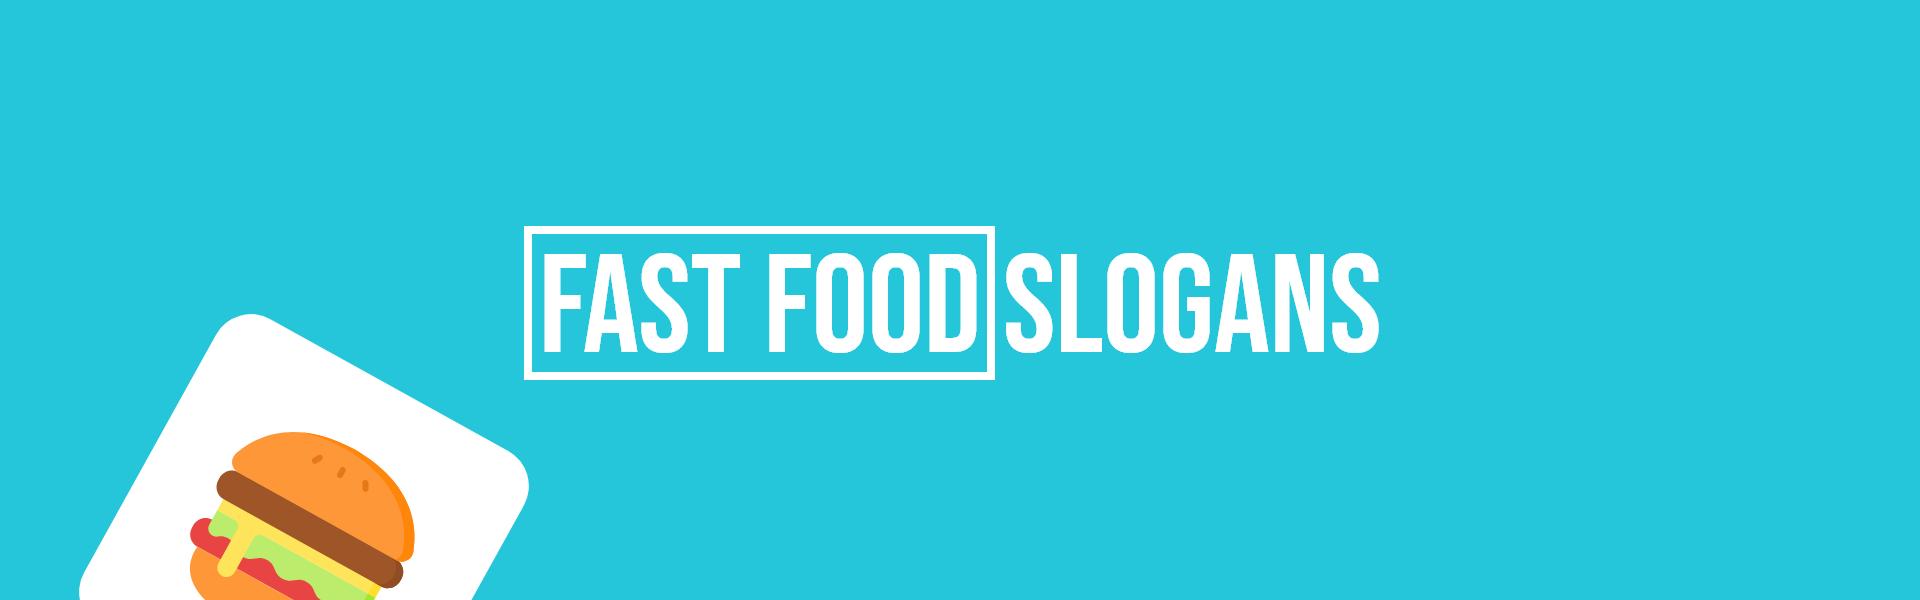 fast food slogans taglines